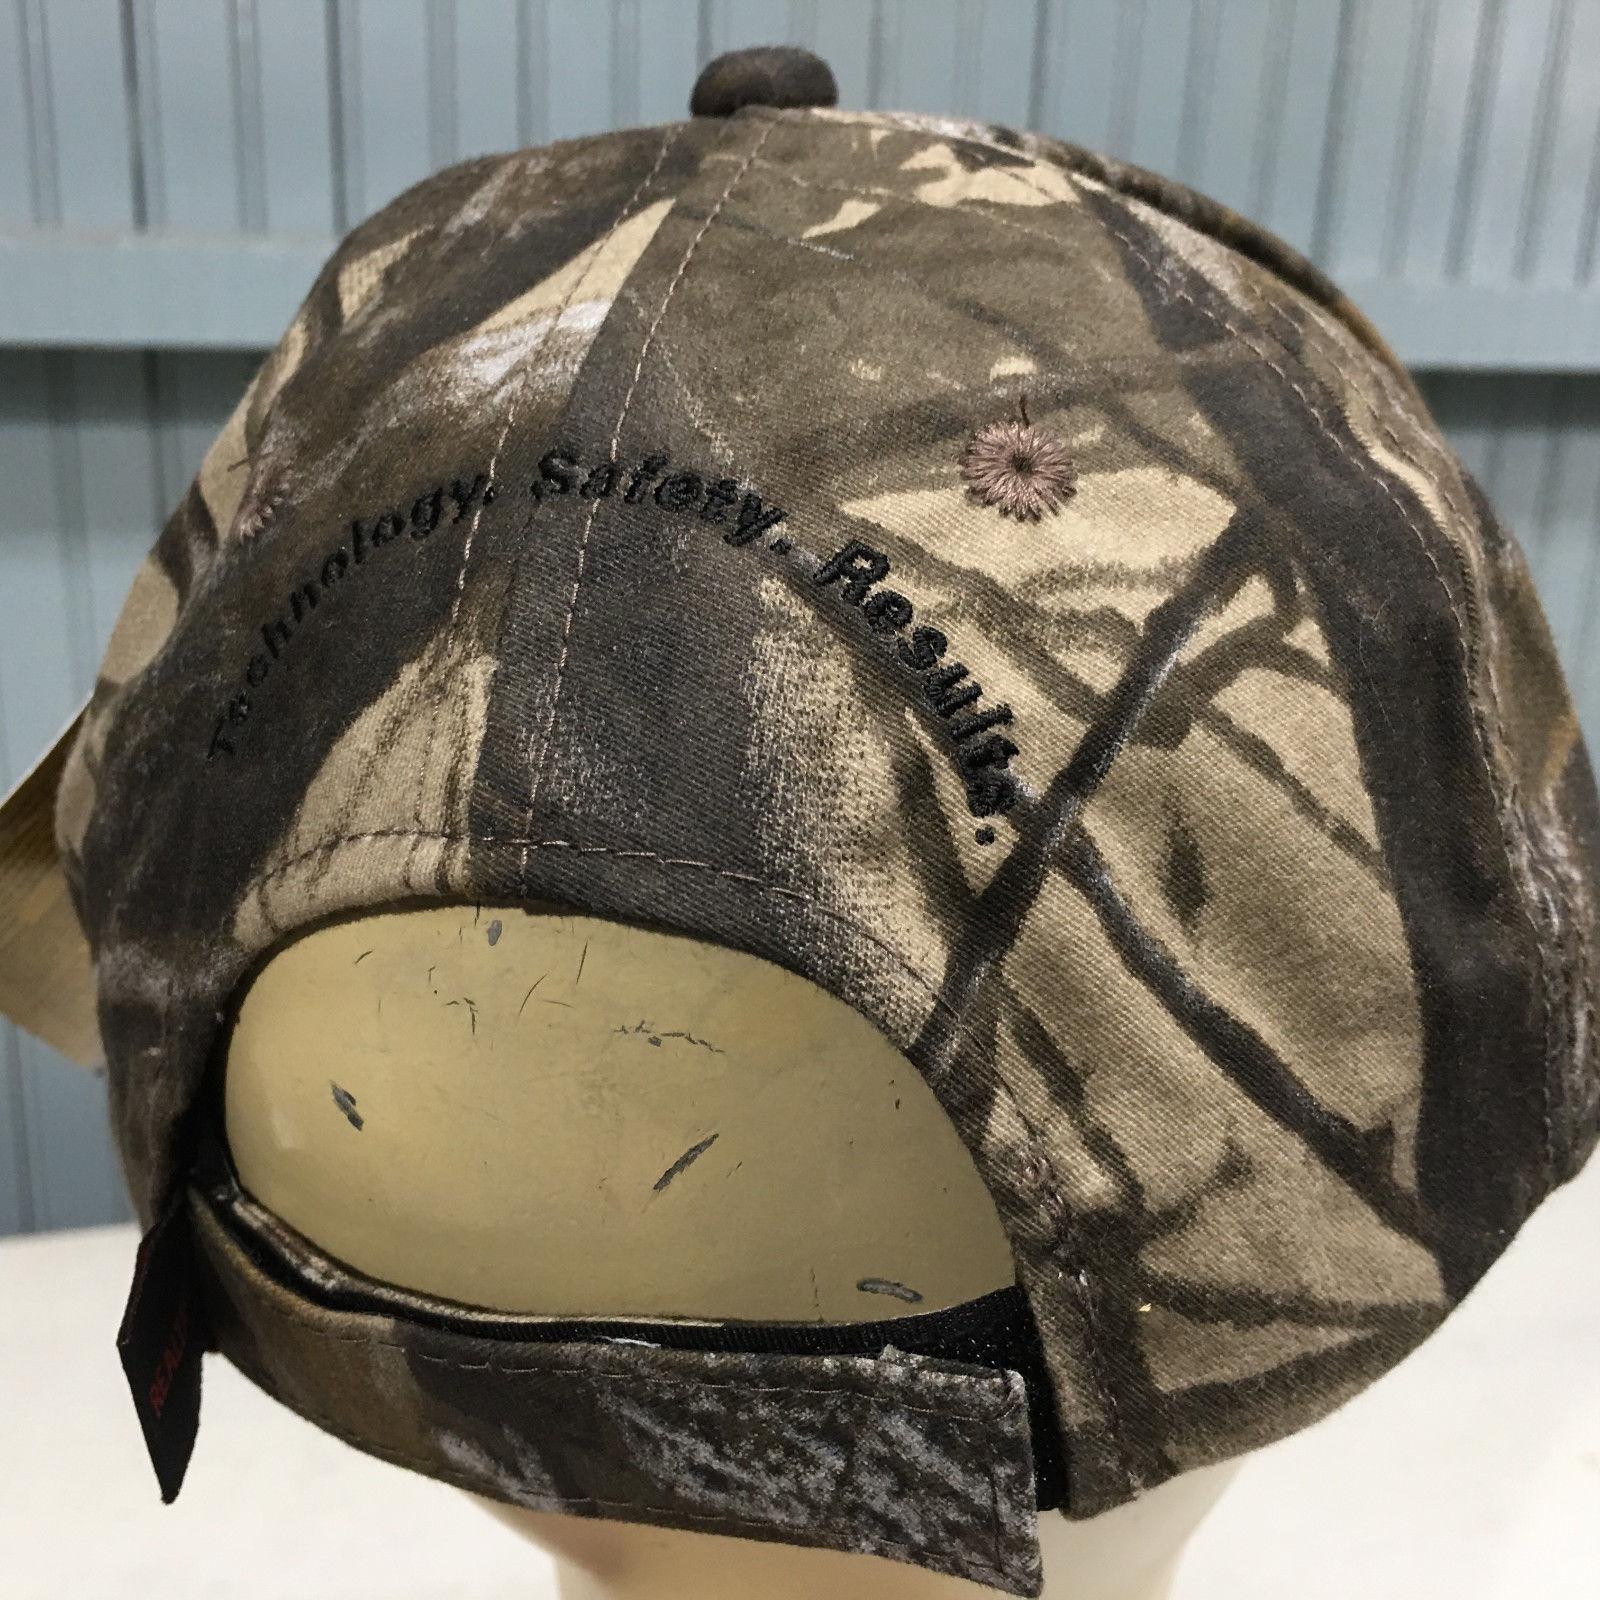 Aquilex WSI Camo Hunting RealTree Adjustable Baseball Cap Hat